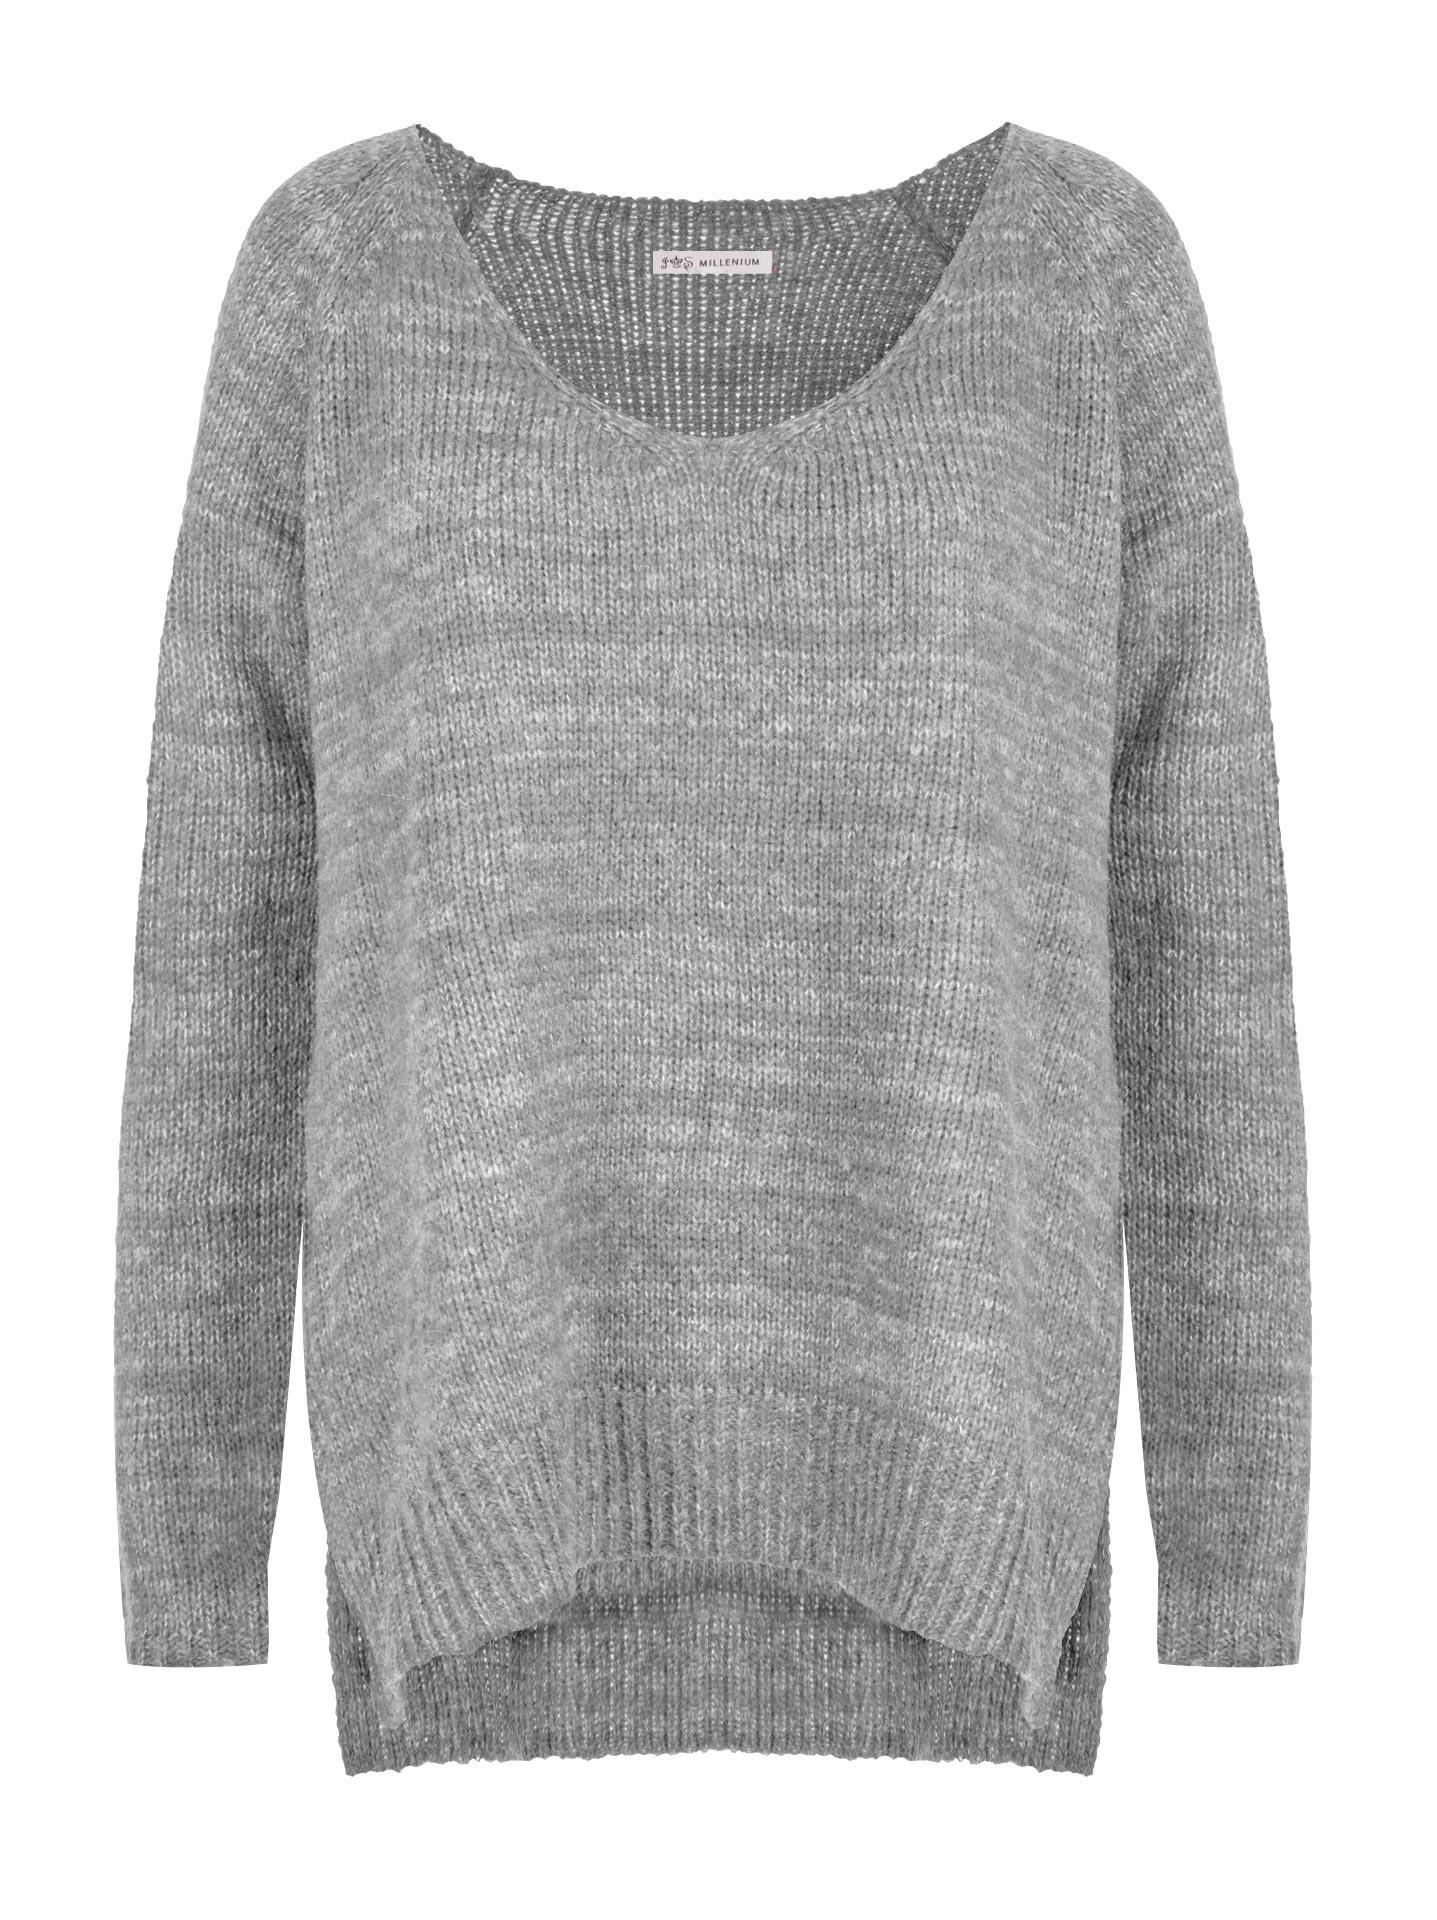 c636eee415da Πλεκτό πουλόβερ με μεταλλιζέ λεπτομέρειες σε γκρι ανοιχτο